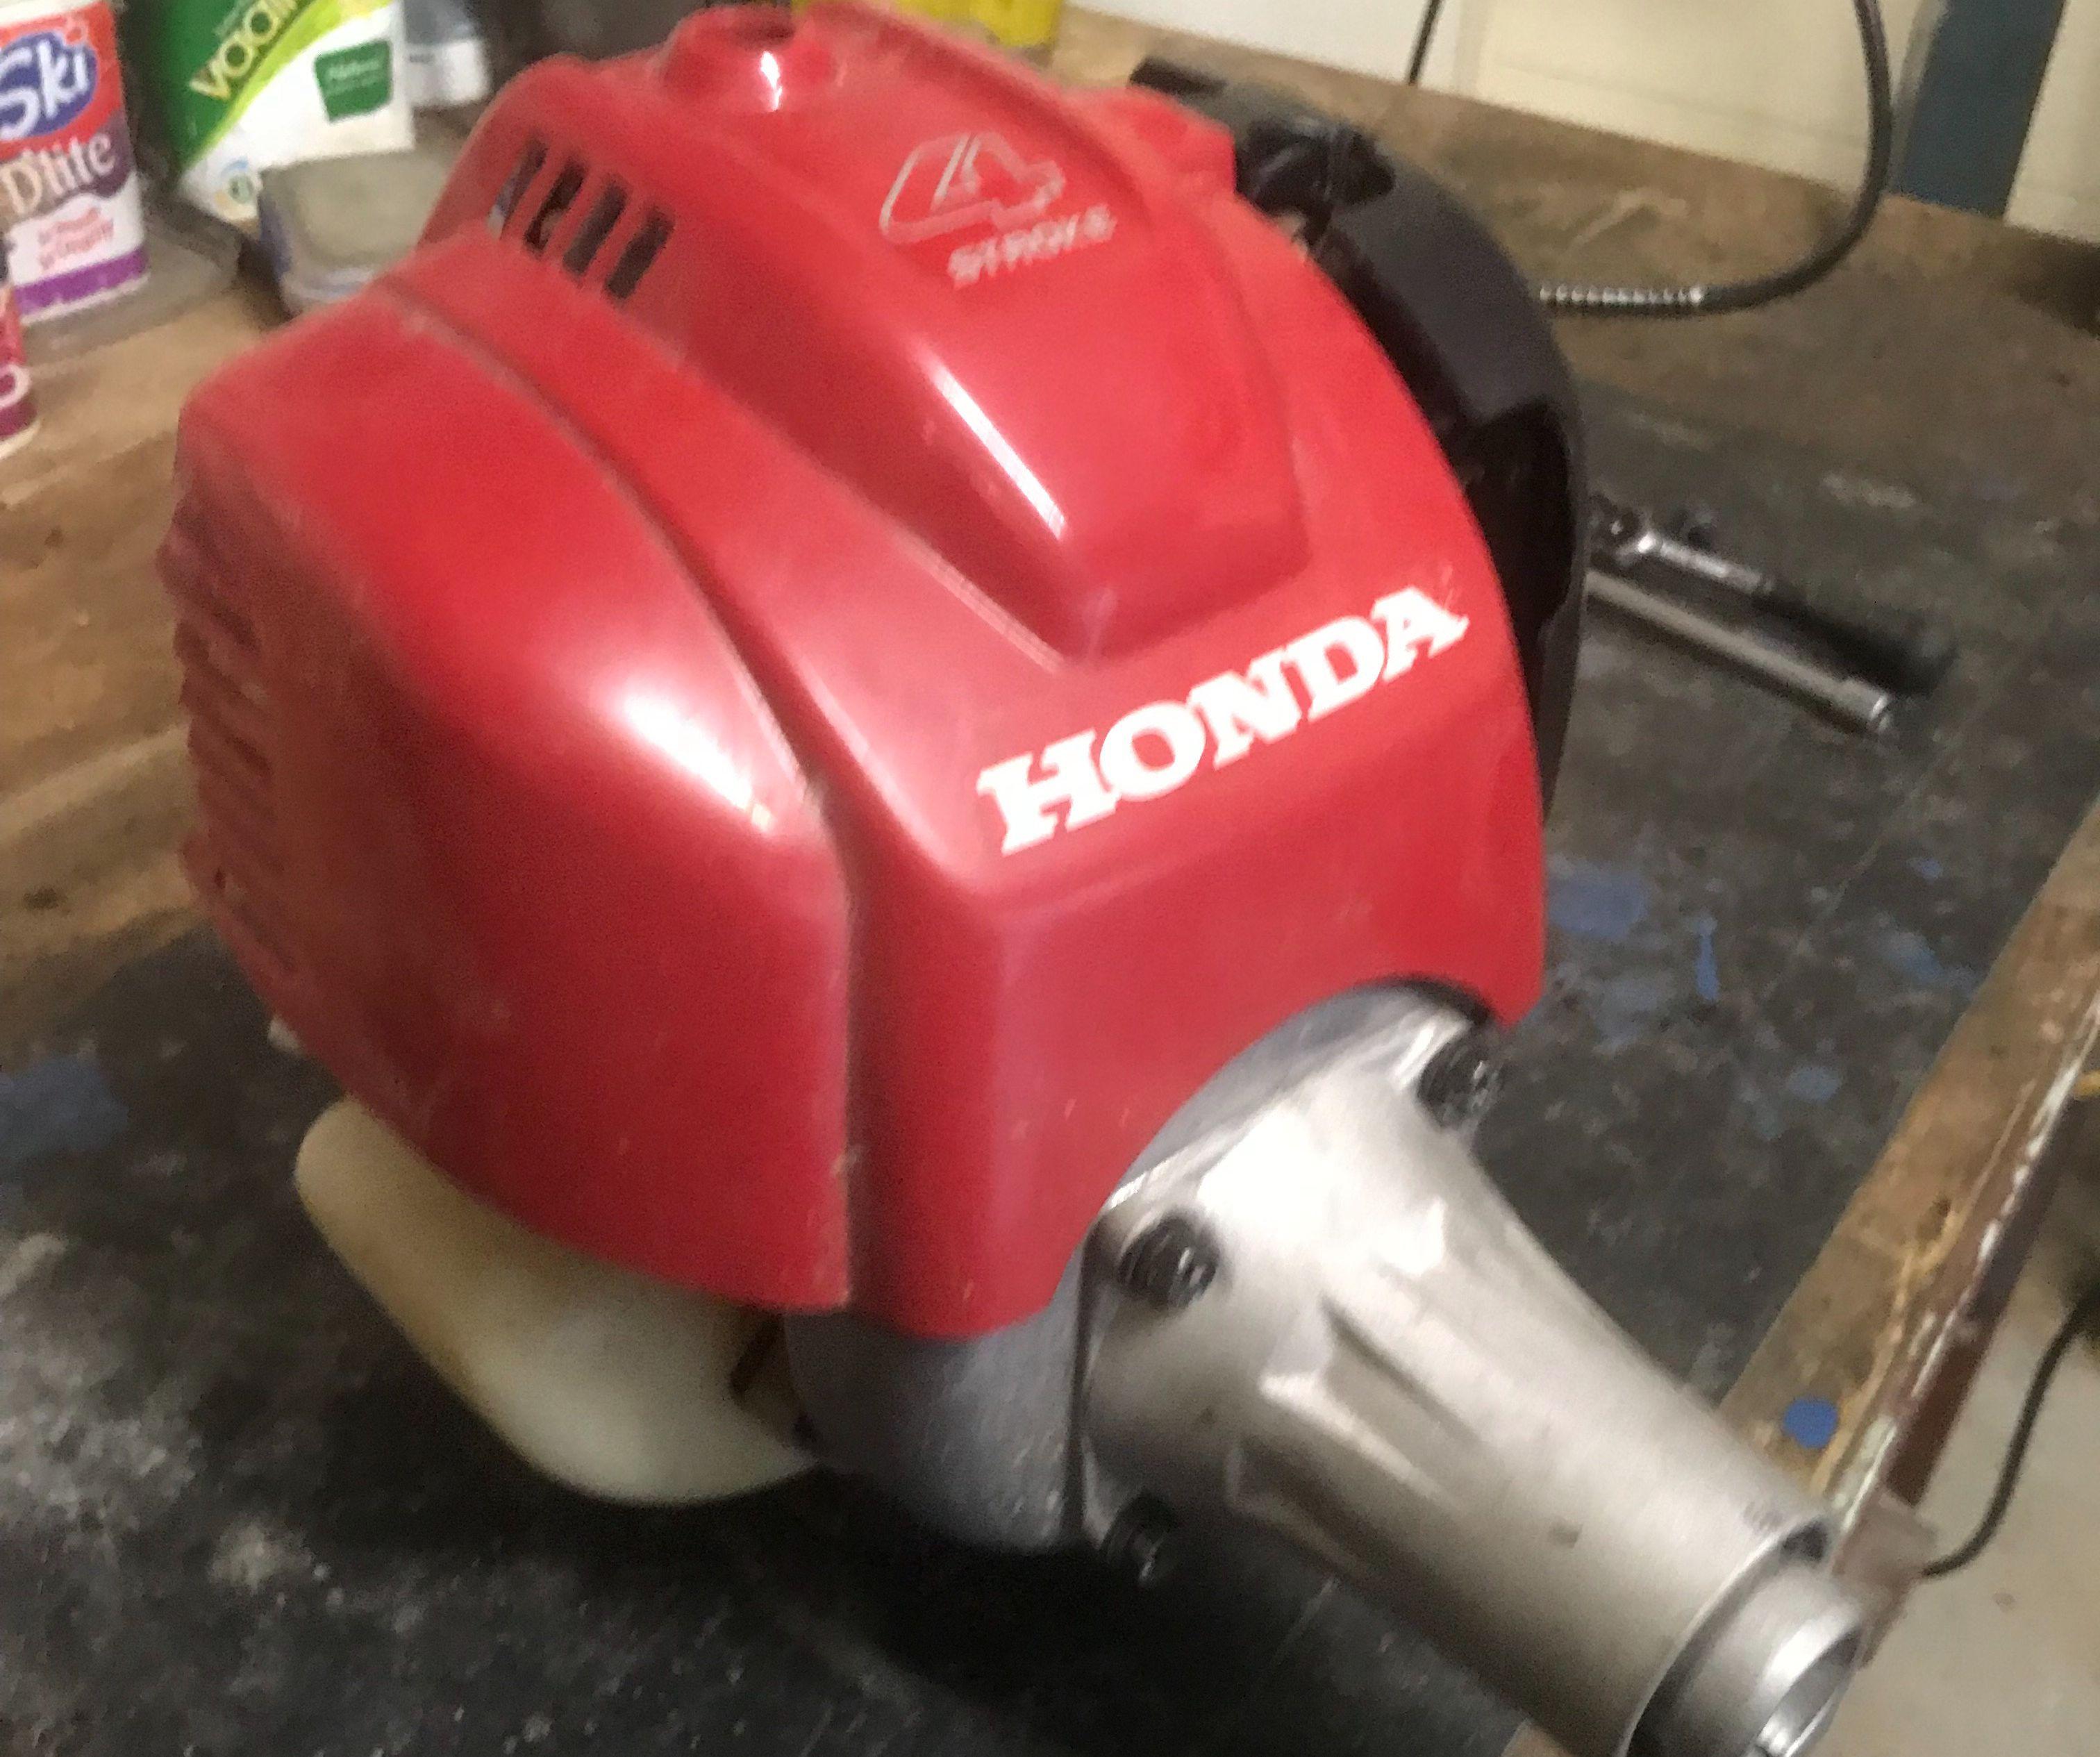 Honda GX25, Part 2: Porting and Mods